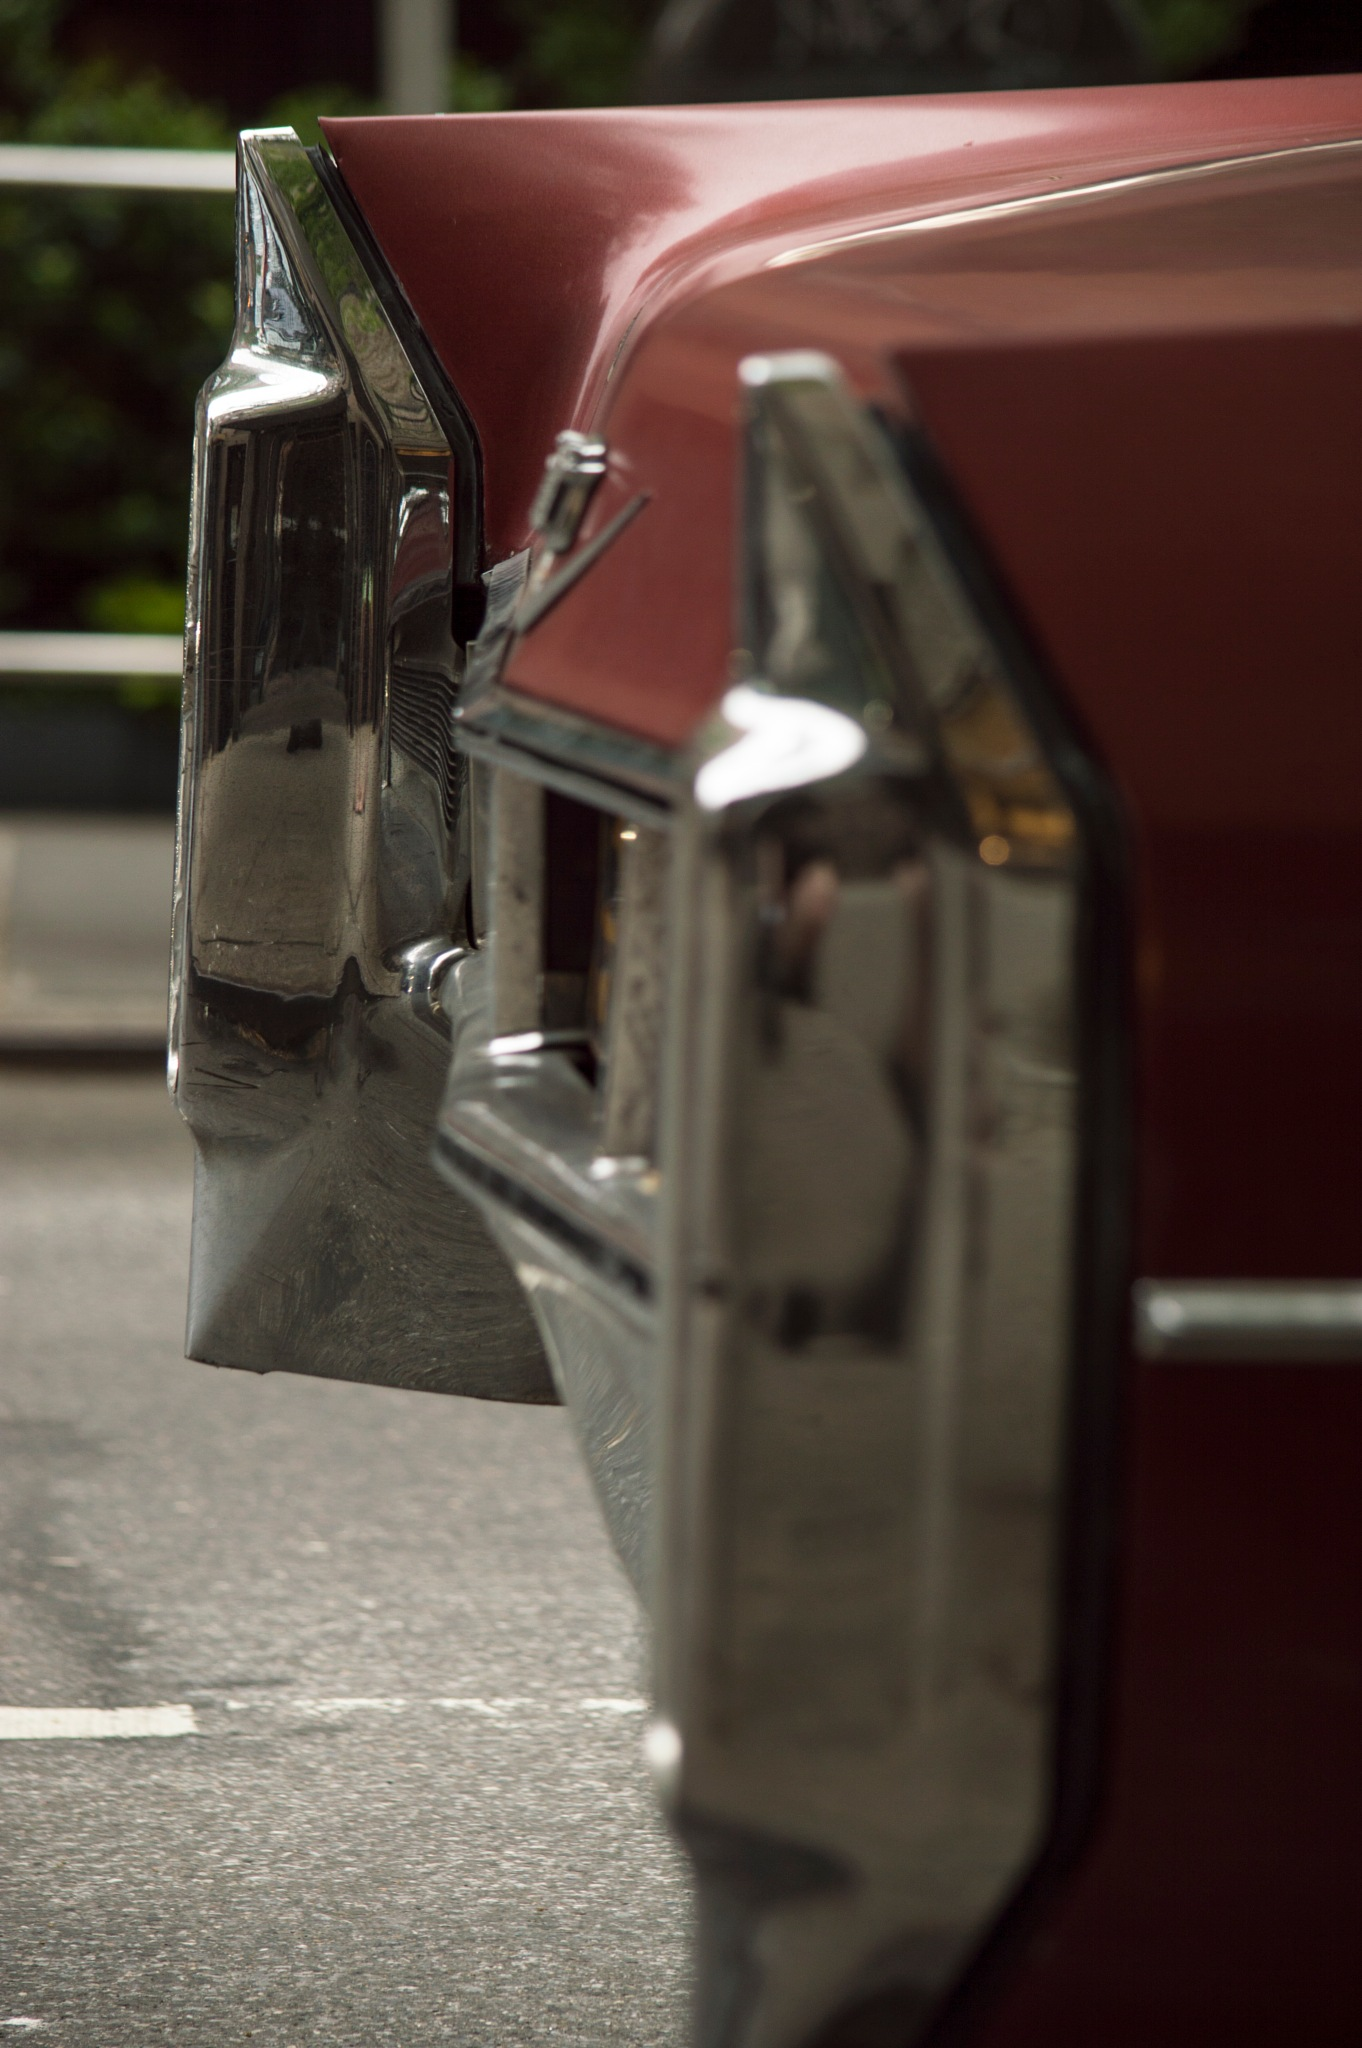 Big Ass Cadillac by Rich Buyer